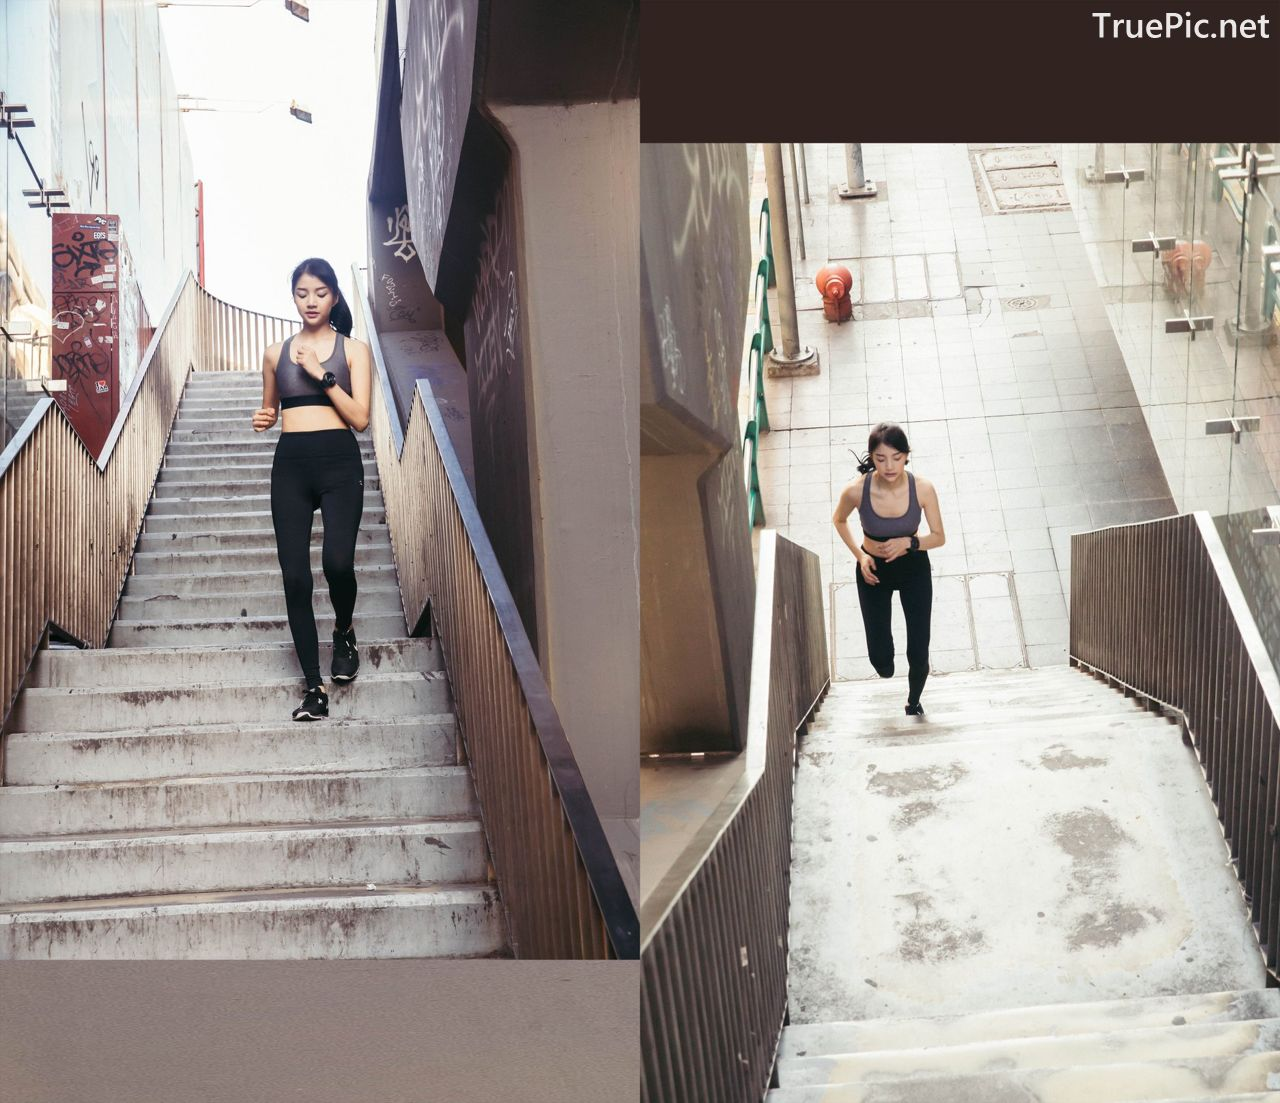 Image-Thailand-Pretty-Model-Anun-Sasinun-Beautiful-Fitness-Girl-TruePic.net- Picture-4